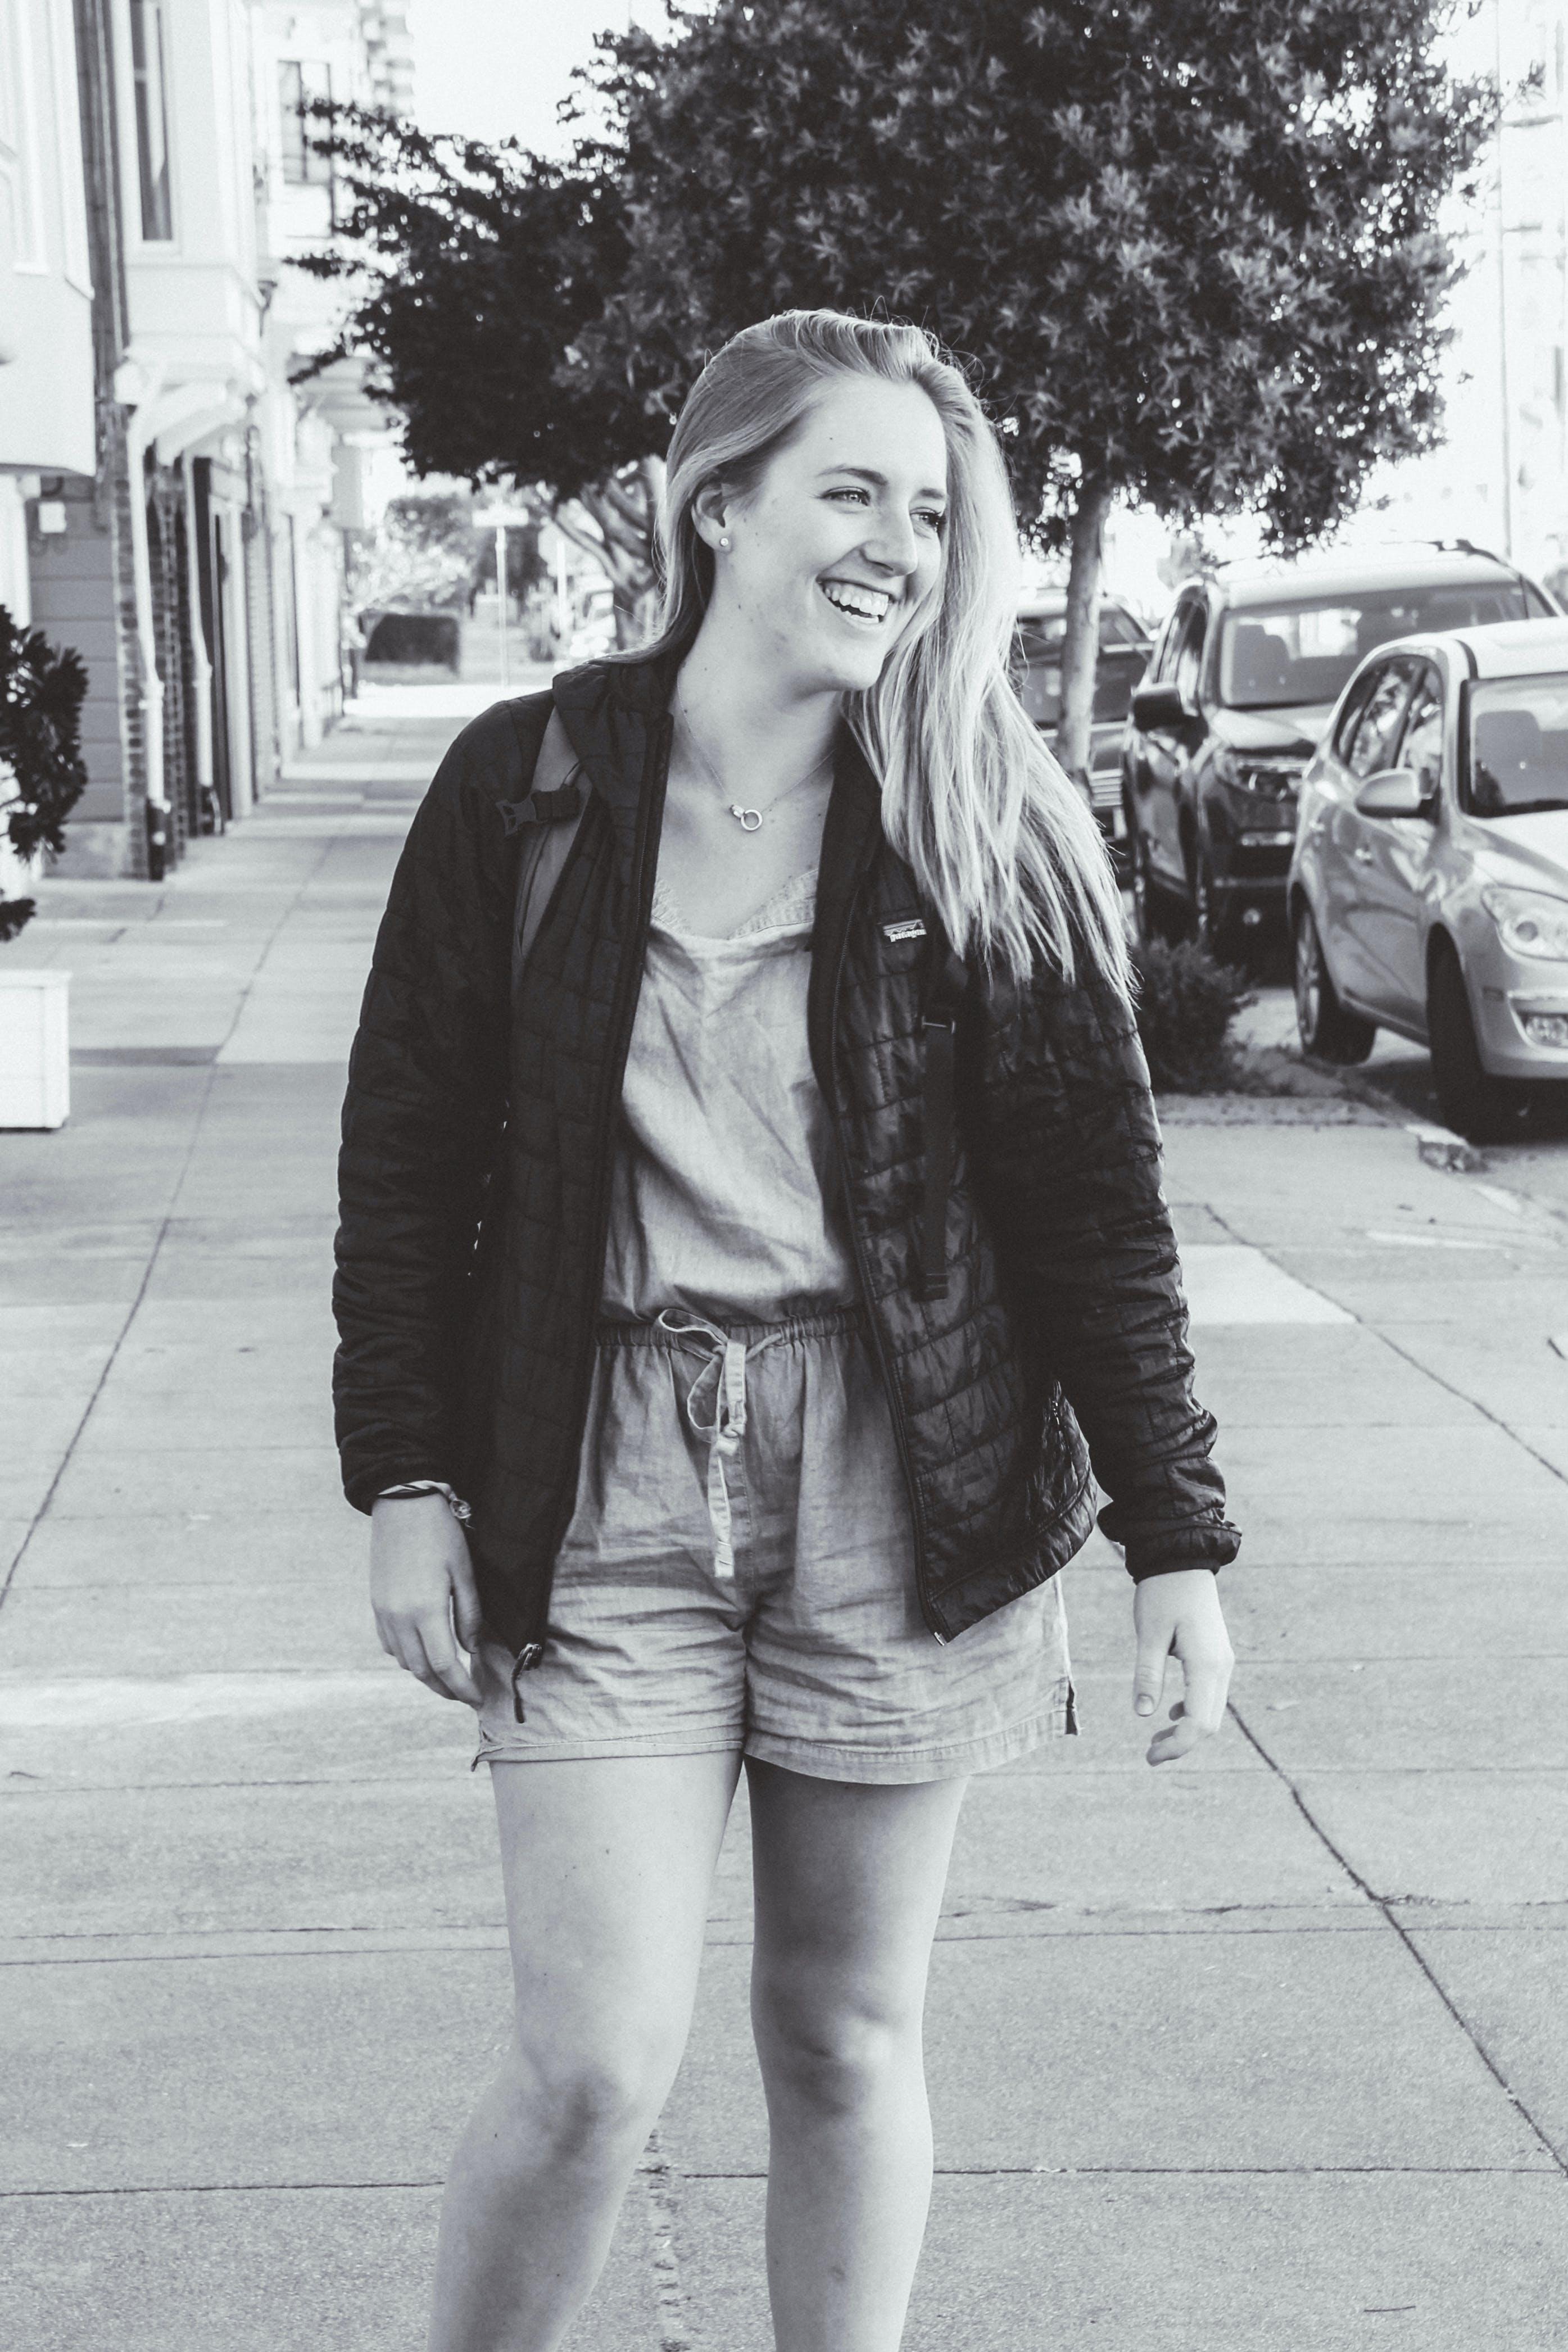 Greyscale Photo of Smiling Woman Wearing Jacket Standing on Pathway